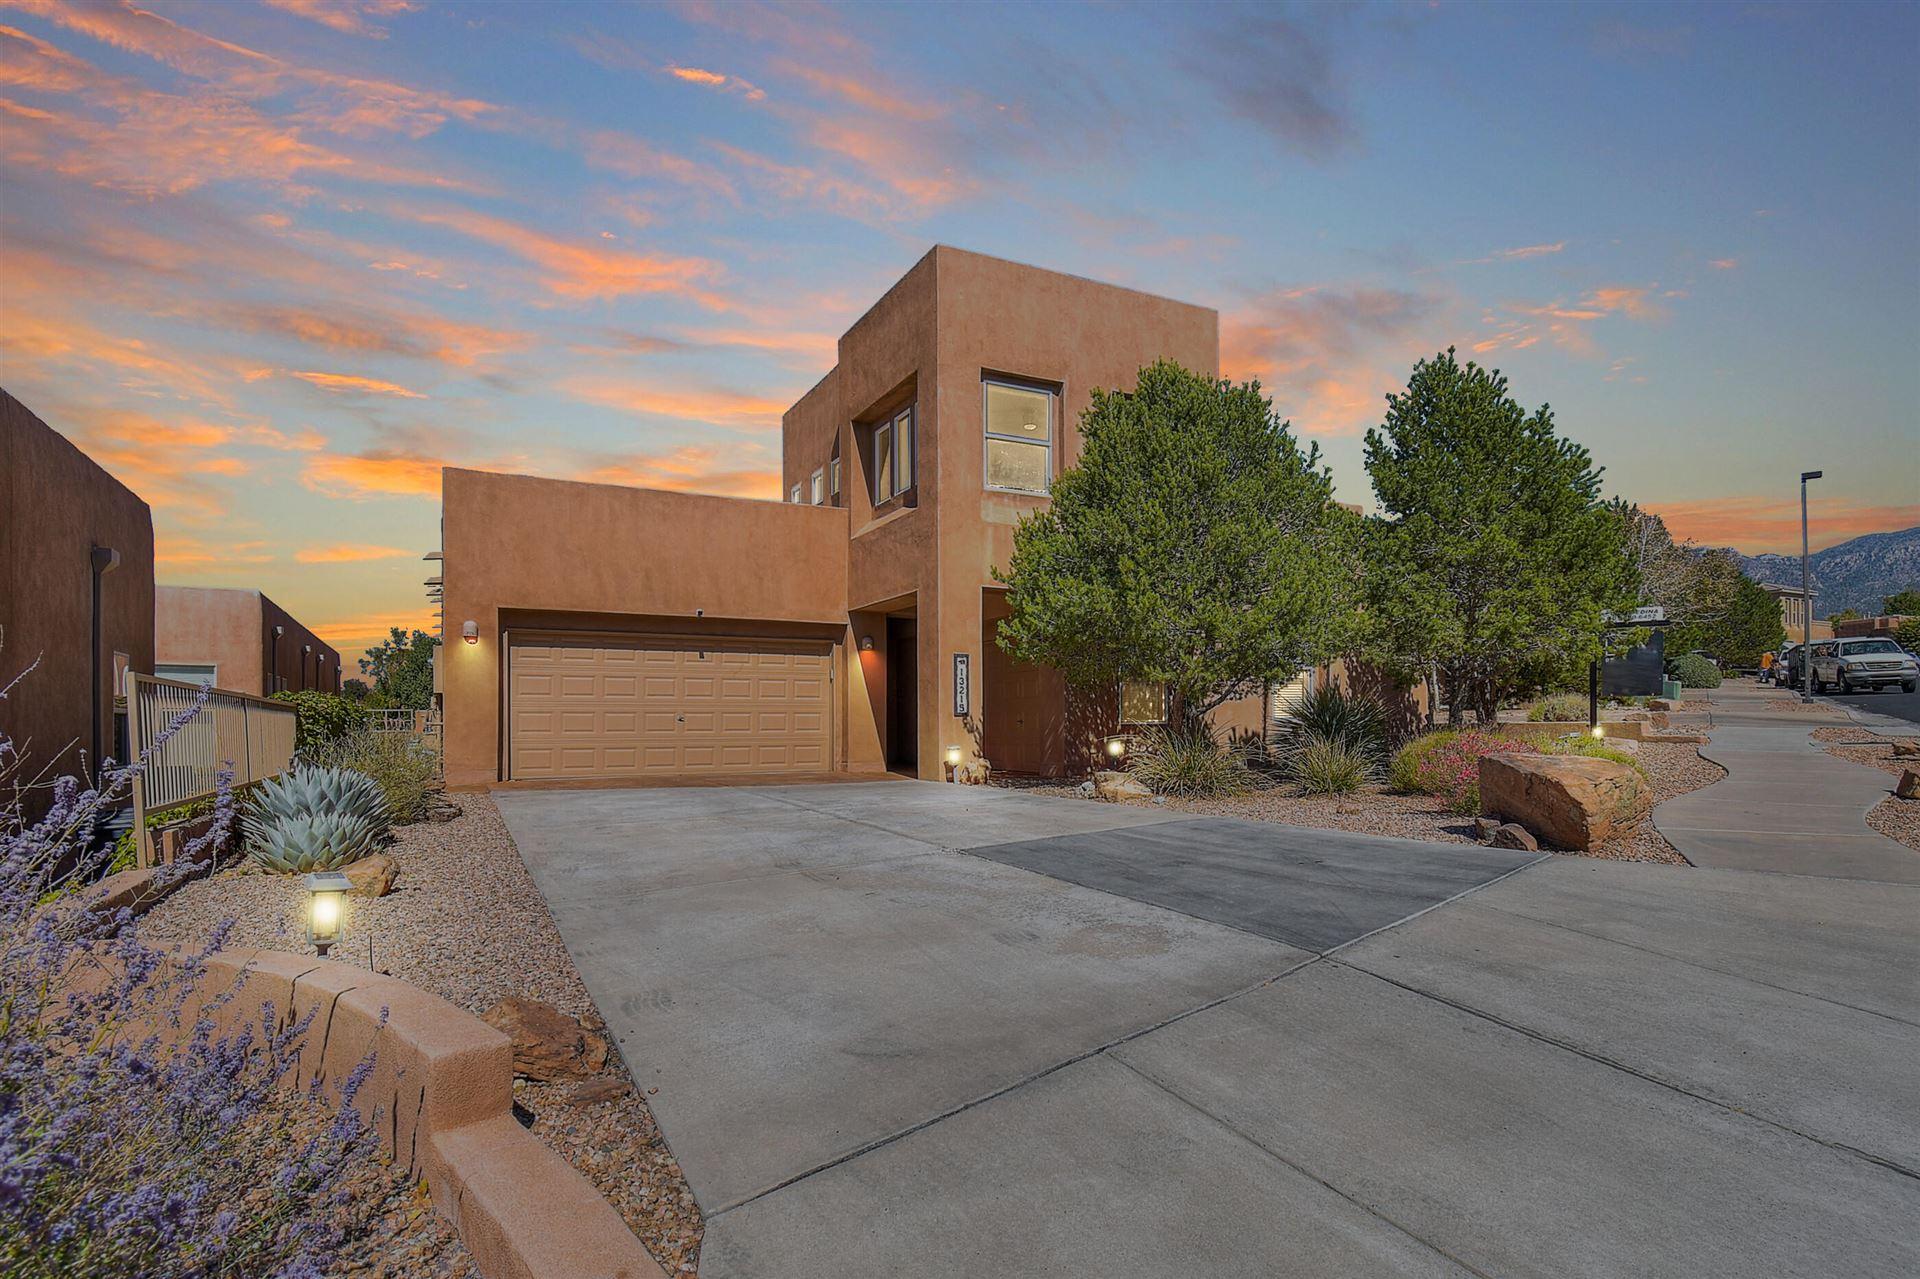 Photo for 13215 SLATERIDGE Place NE, Albuquerque, NM 87111 (MLS # 979282)